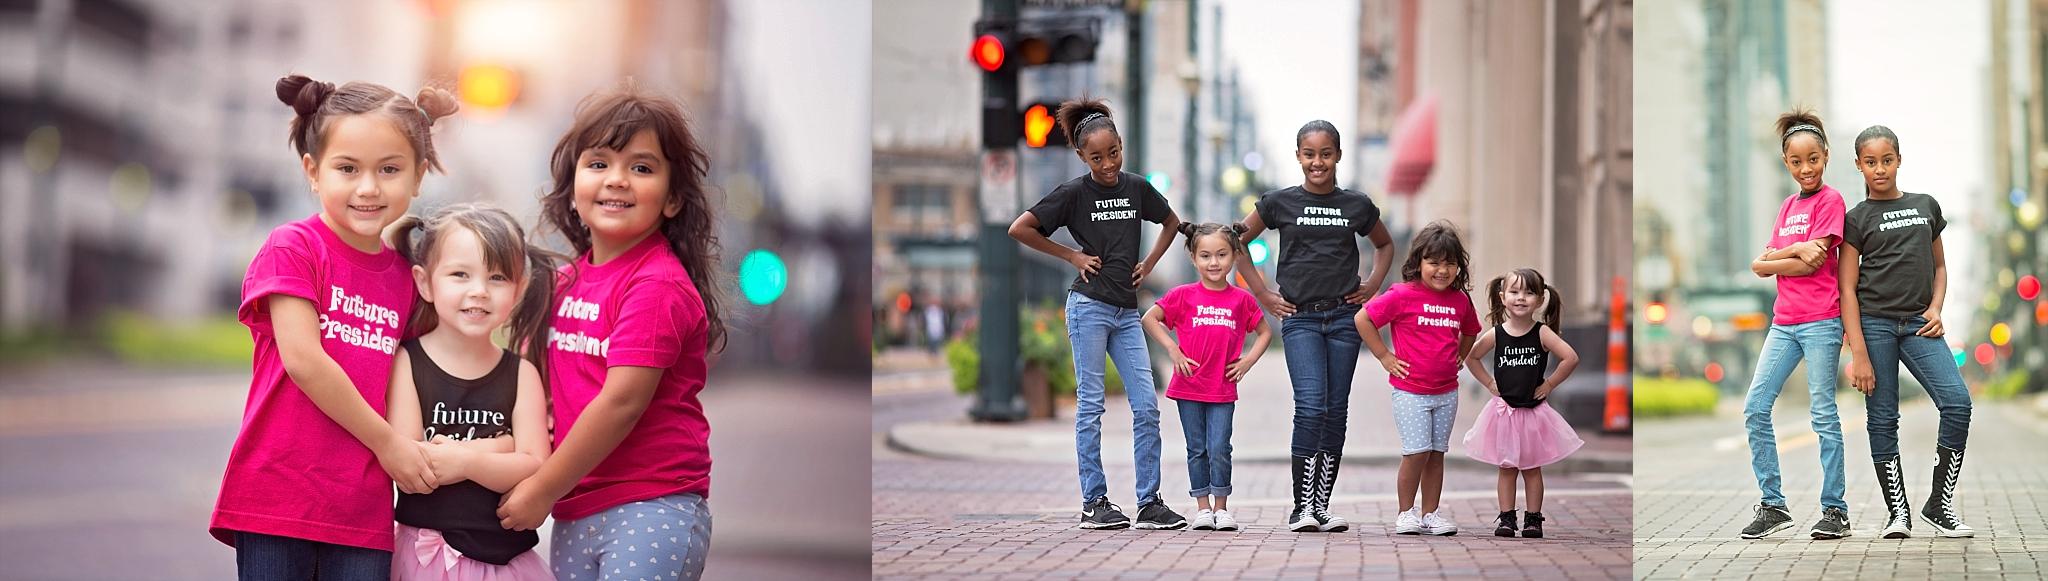 Houston Child Photographer | Maribella Portraits, LLC | www.maribellaportraits.rocks